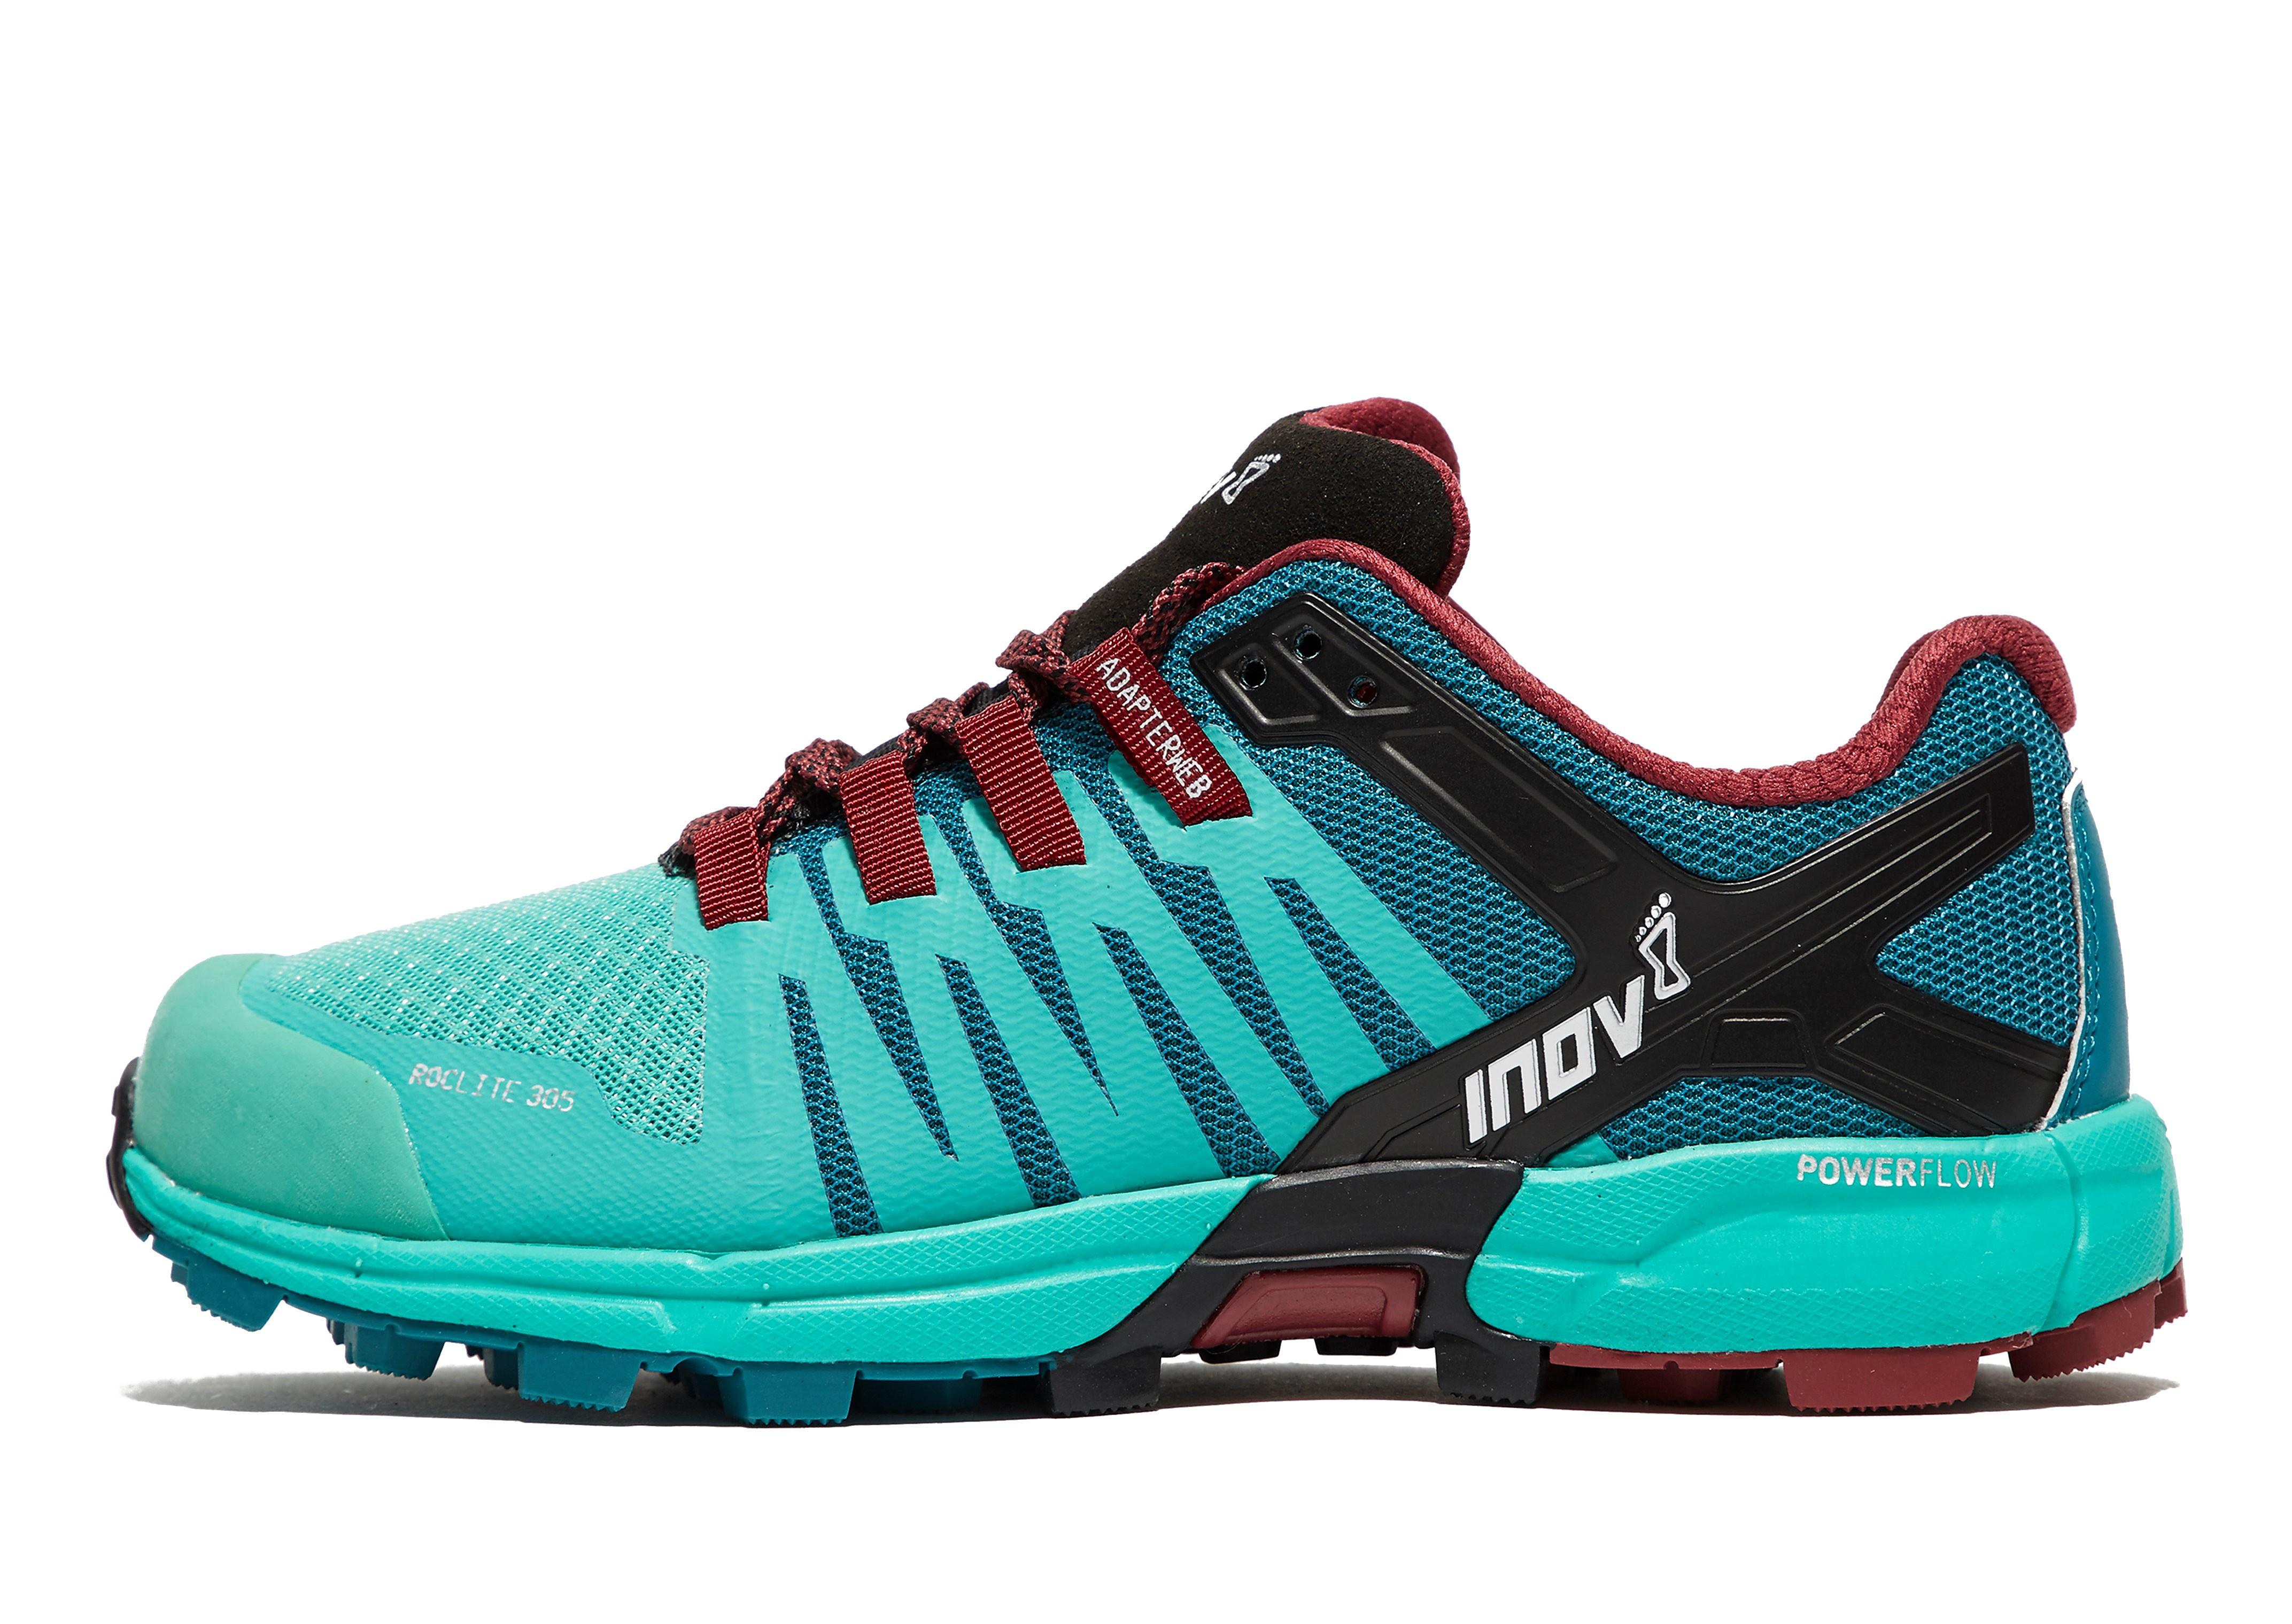 Inov-8 Roclite 305 Trail Running Shoes